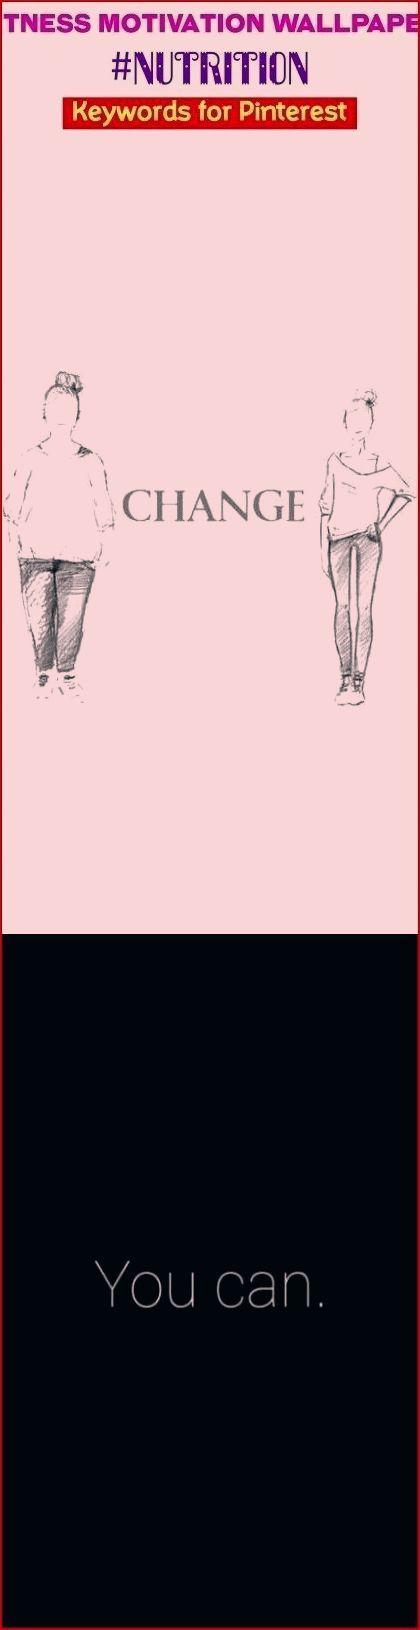 Fitness motivation wallpaper #nutrition #keywords #niches #seo #education. fitne... -  - #Education...